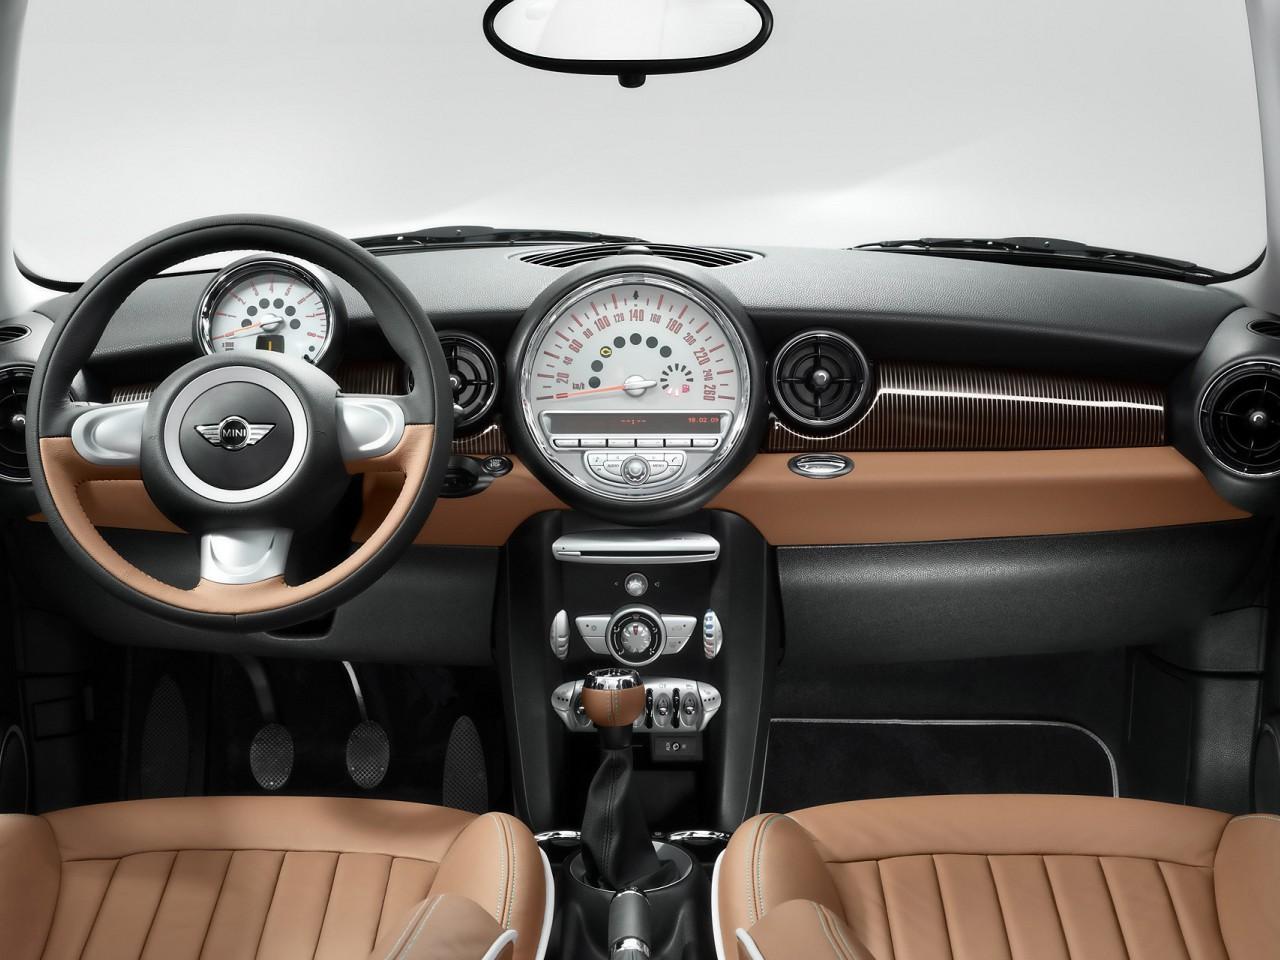 2009 Mini Cooper D 50 Mayfair Motor Desktop